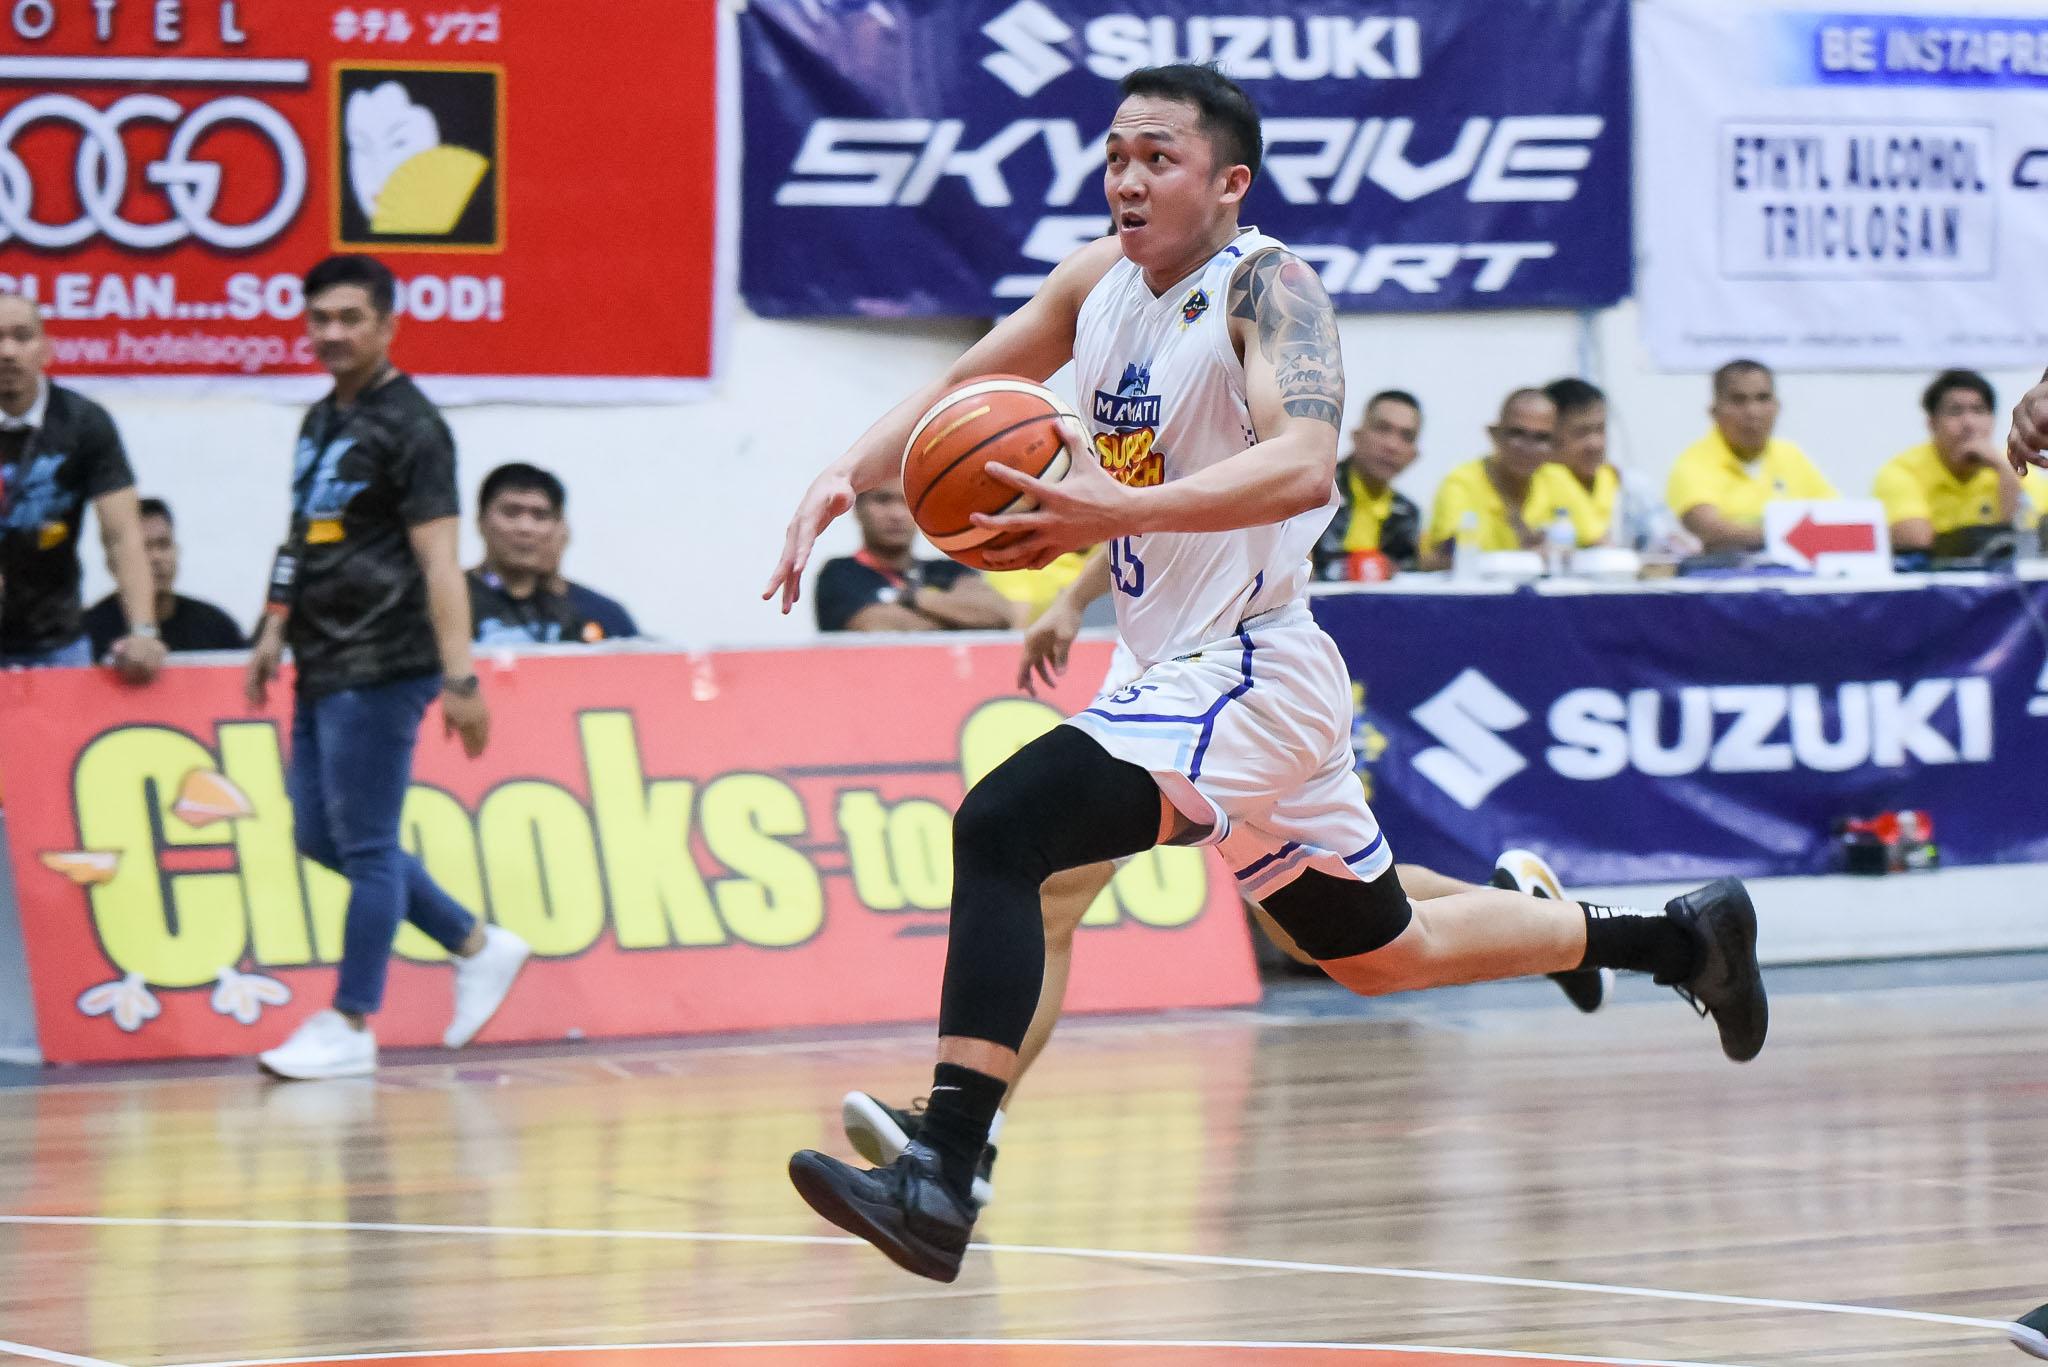 Tiebreaker Times Makati-Super Crunch end up being closer after crisis, says Baloria Basketball MPBL News  Rhuel Acot Makati Super Crunch Juneric Baloria 2019-20 MPBL Lakan Cup